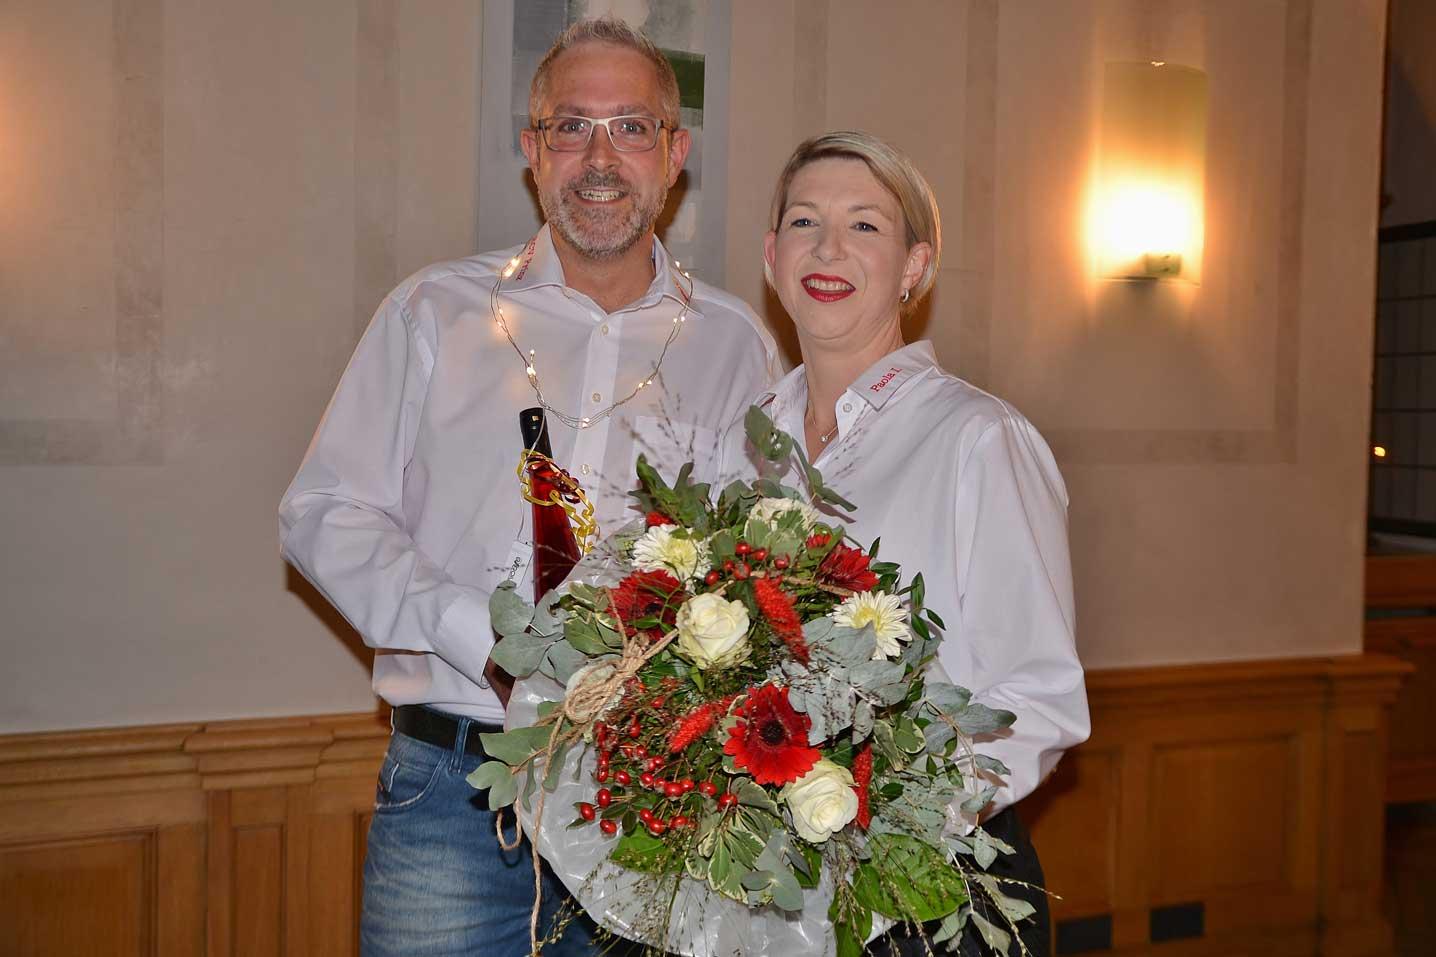 RCV-Prinzenpaar-Marc-I-und-Paola-I